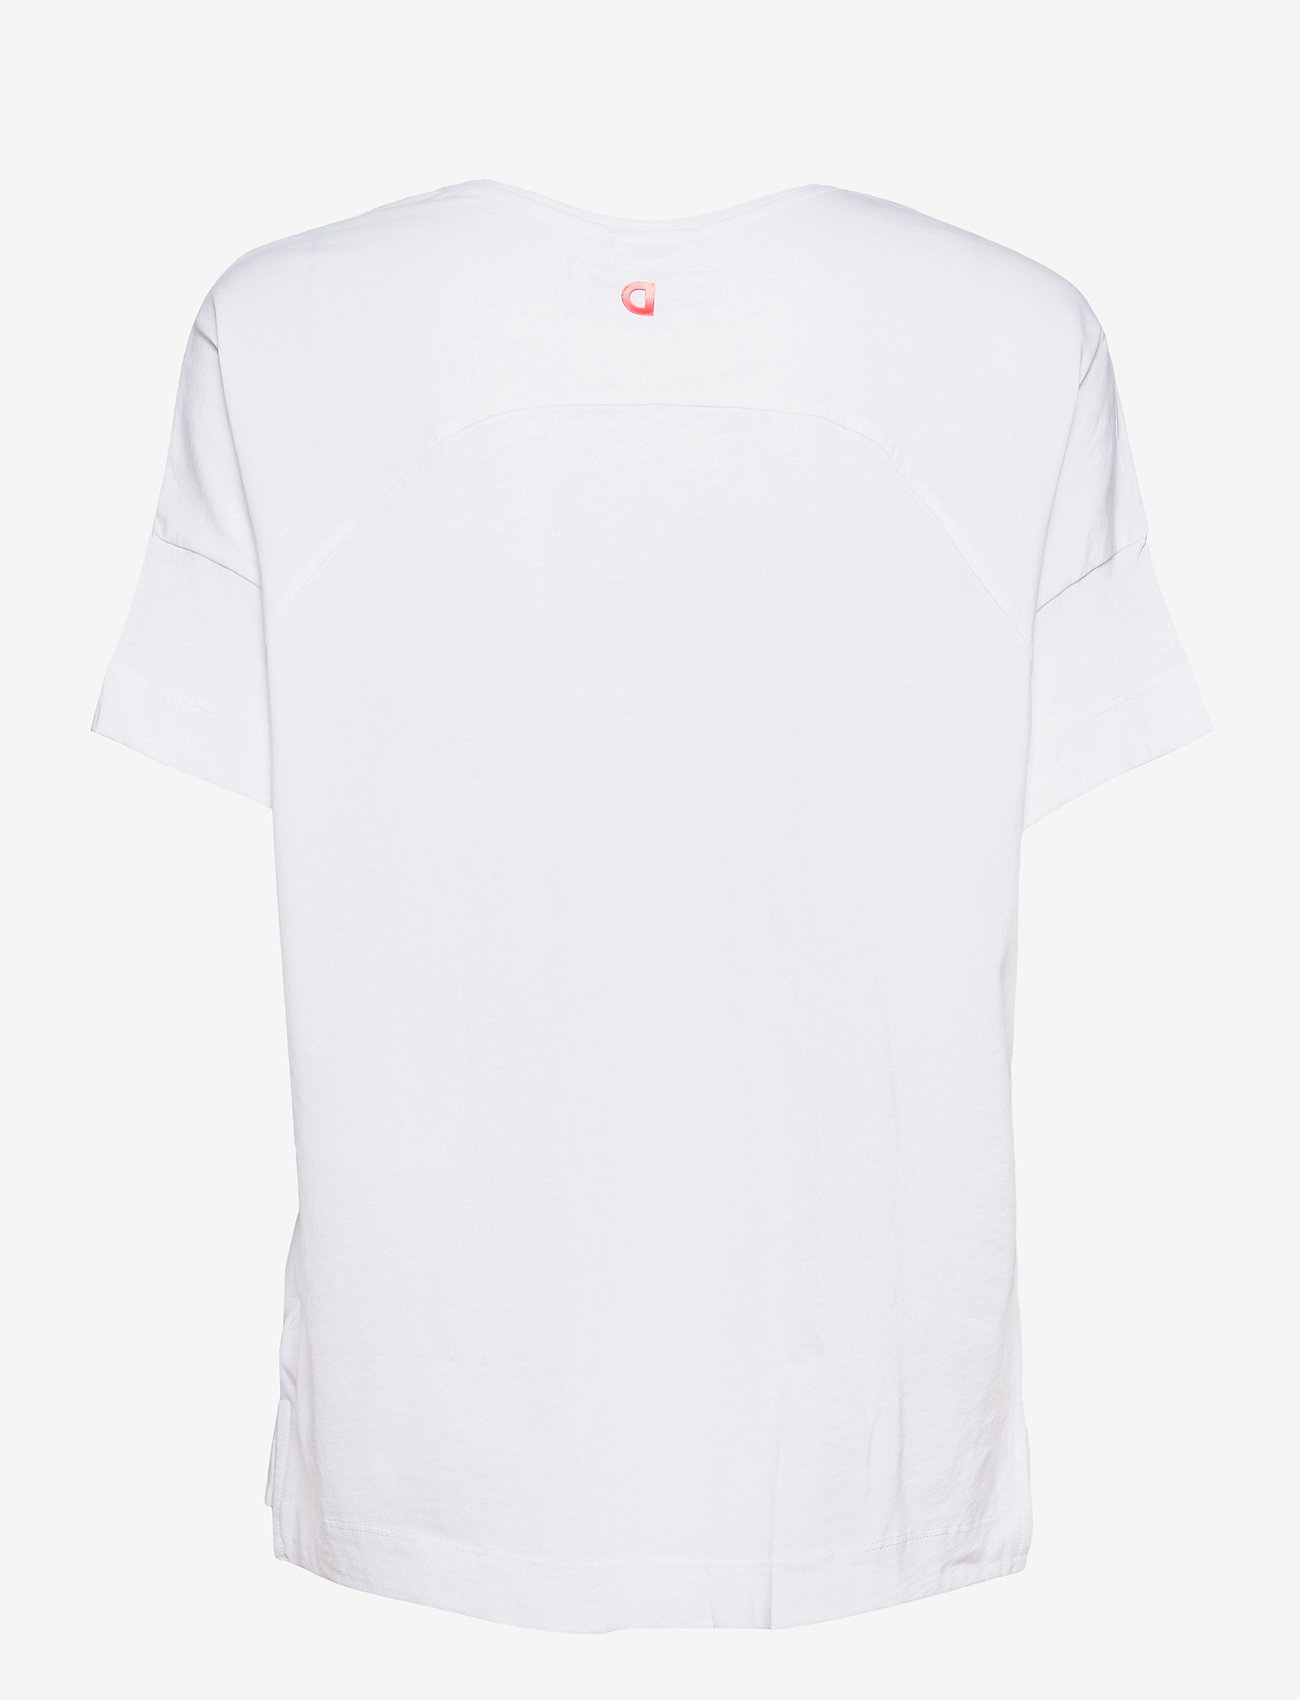 Desigual - T SHIRT OVERSIZE GALACTI - t-shirts - blanco - 1